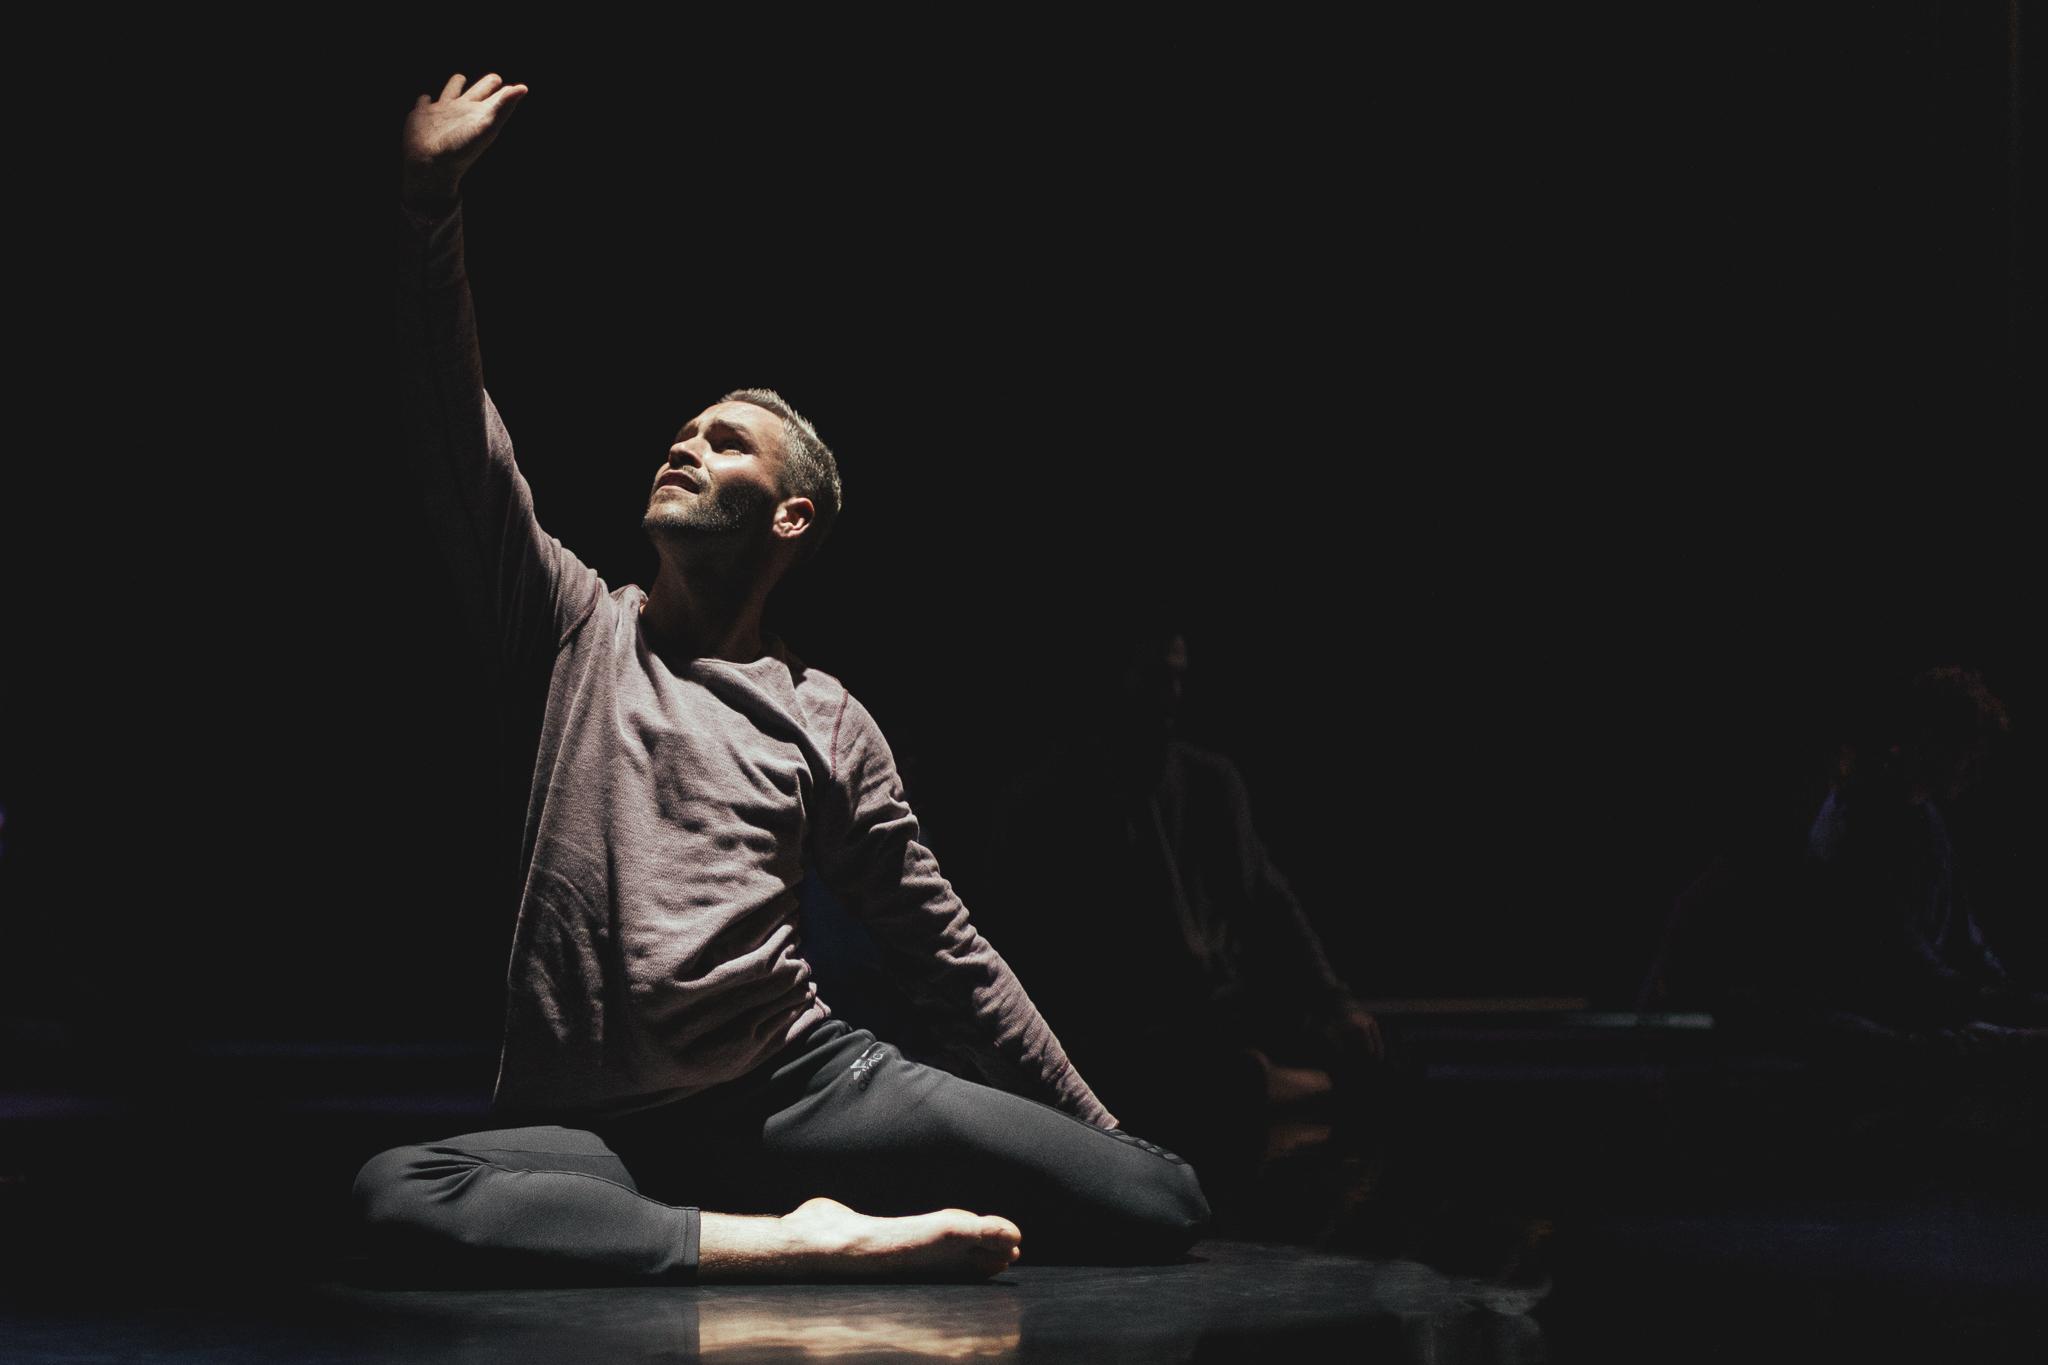 Nick Lazzarini, Dancer